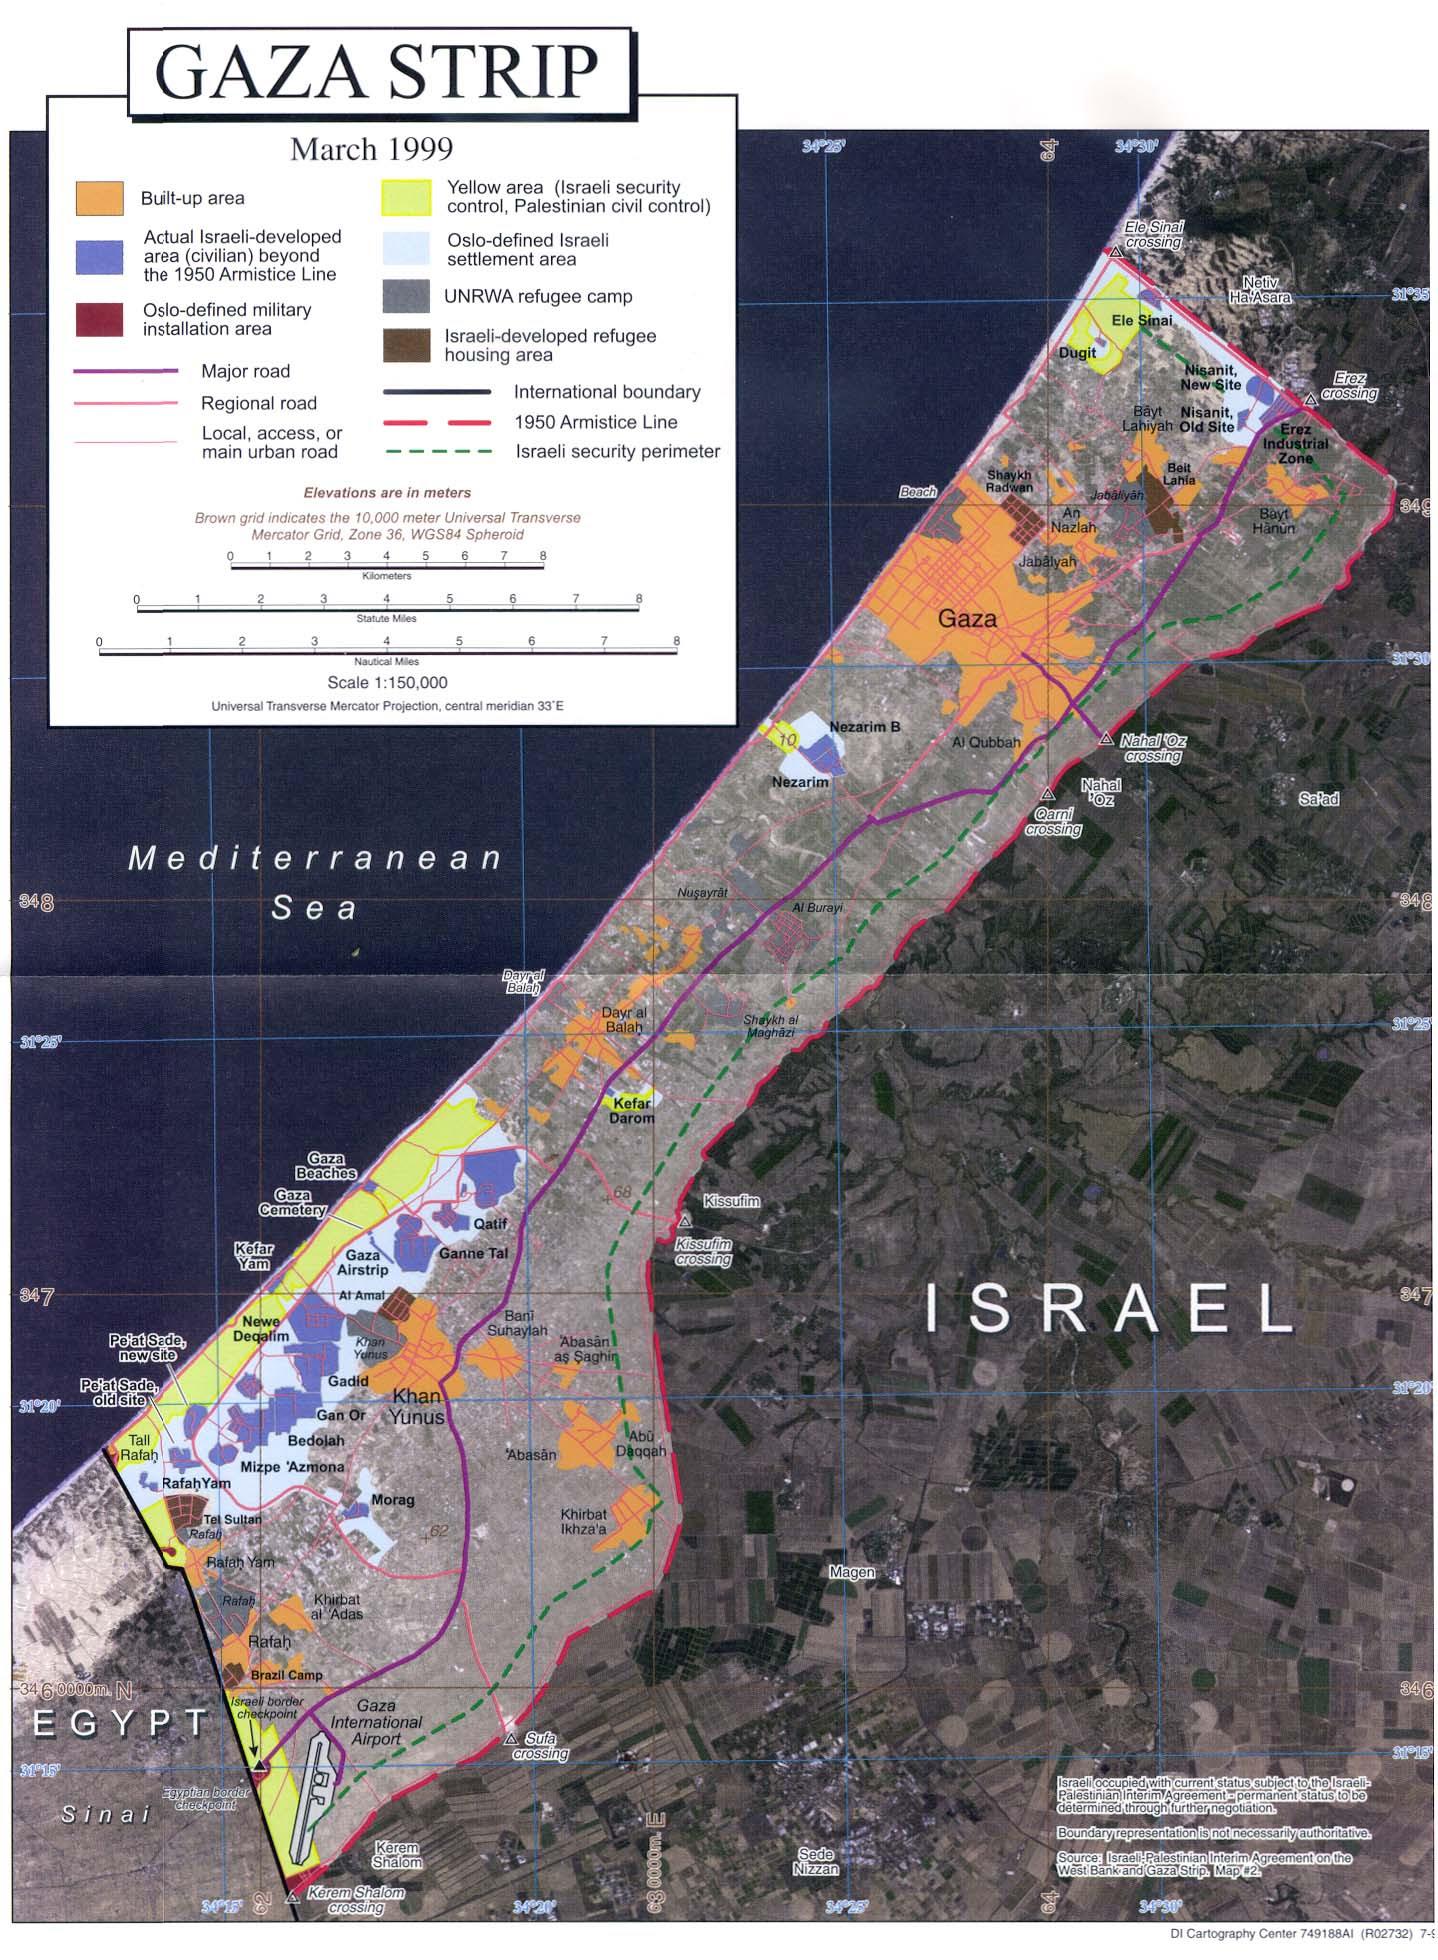 http://www.lib.utexas.edu/maps/middle_east_and_asia/gaza_strip_1999.jpg